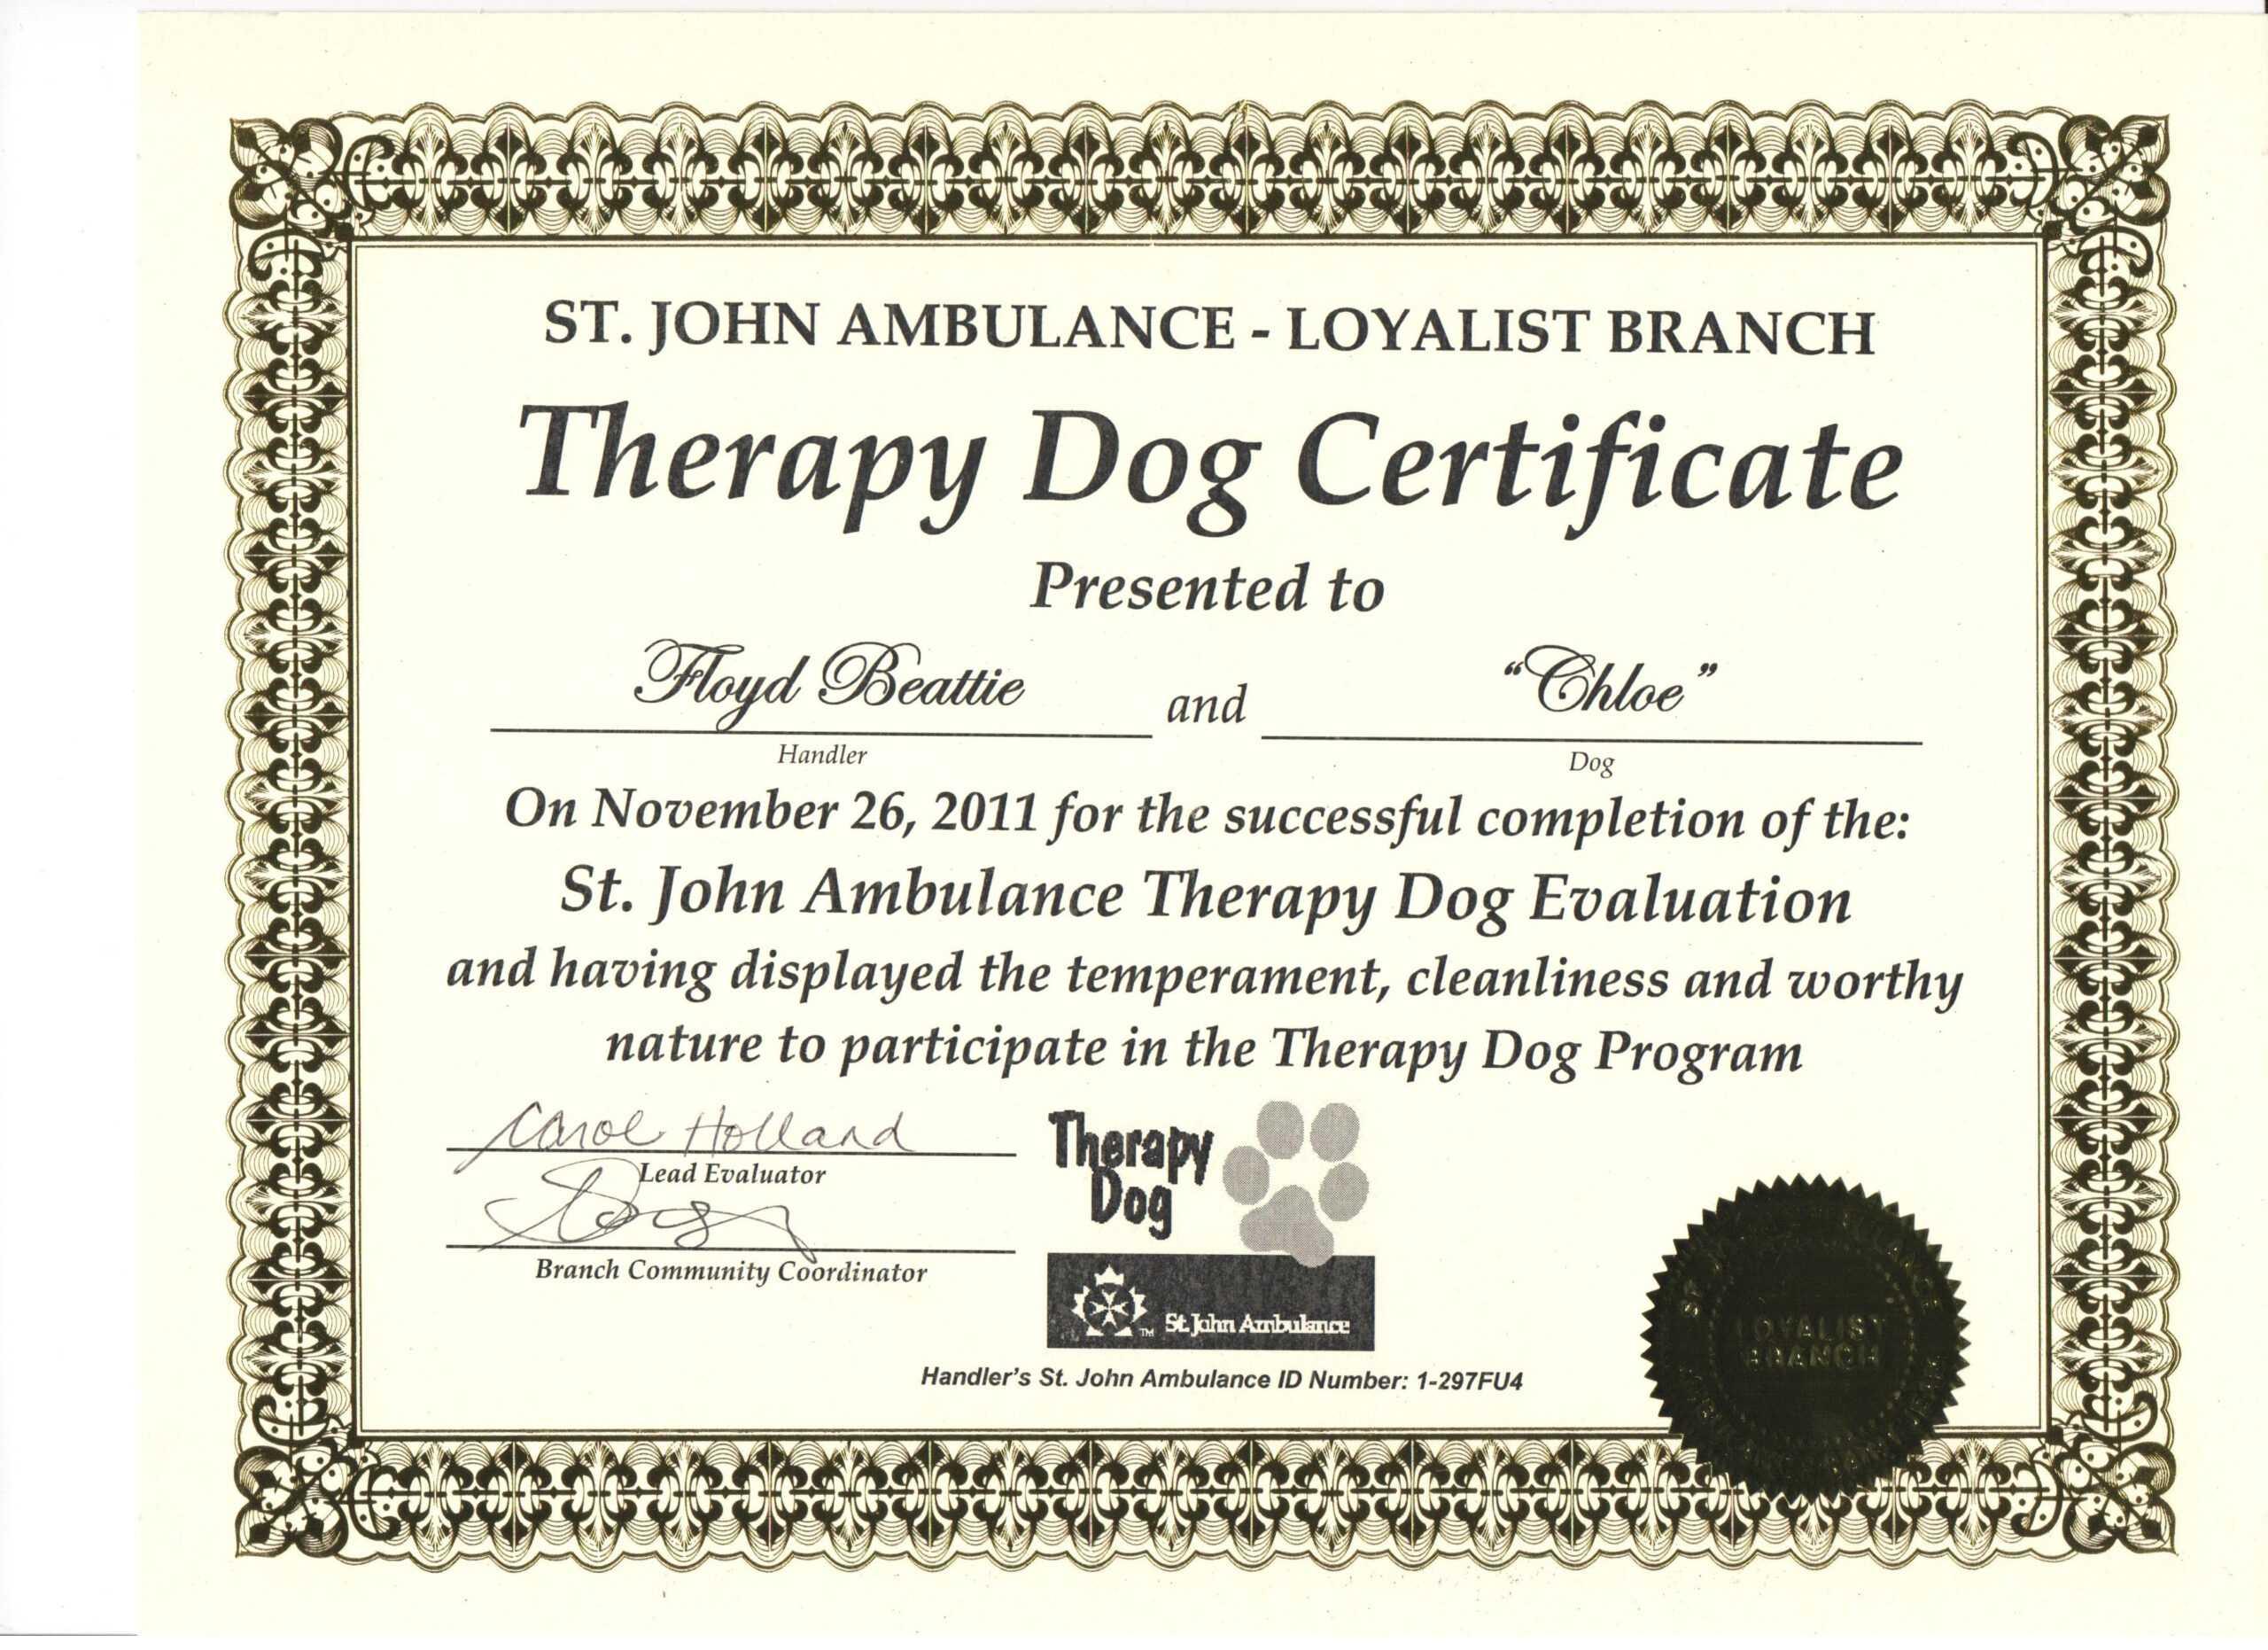 002 Service Dog Certificate Template Free Ideas Therapy With Service Dog Certificate Template